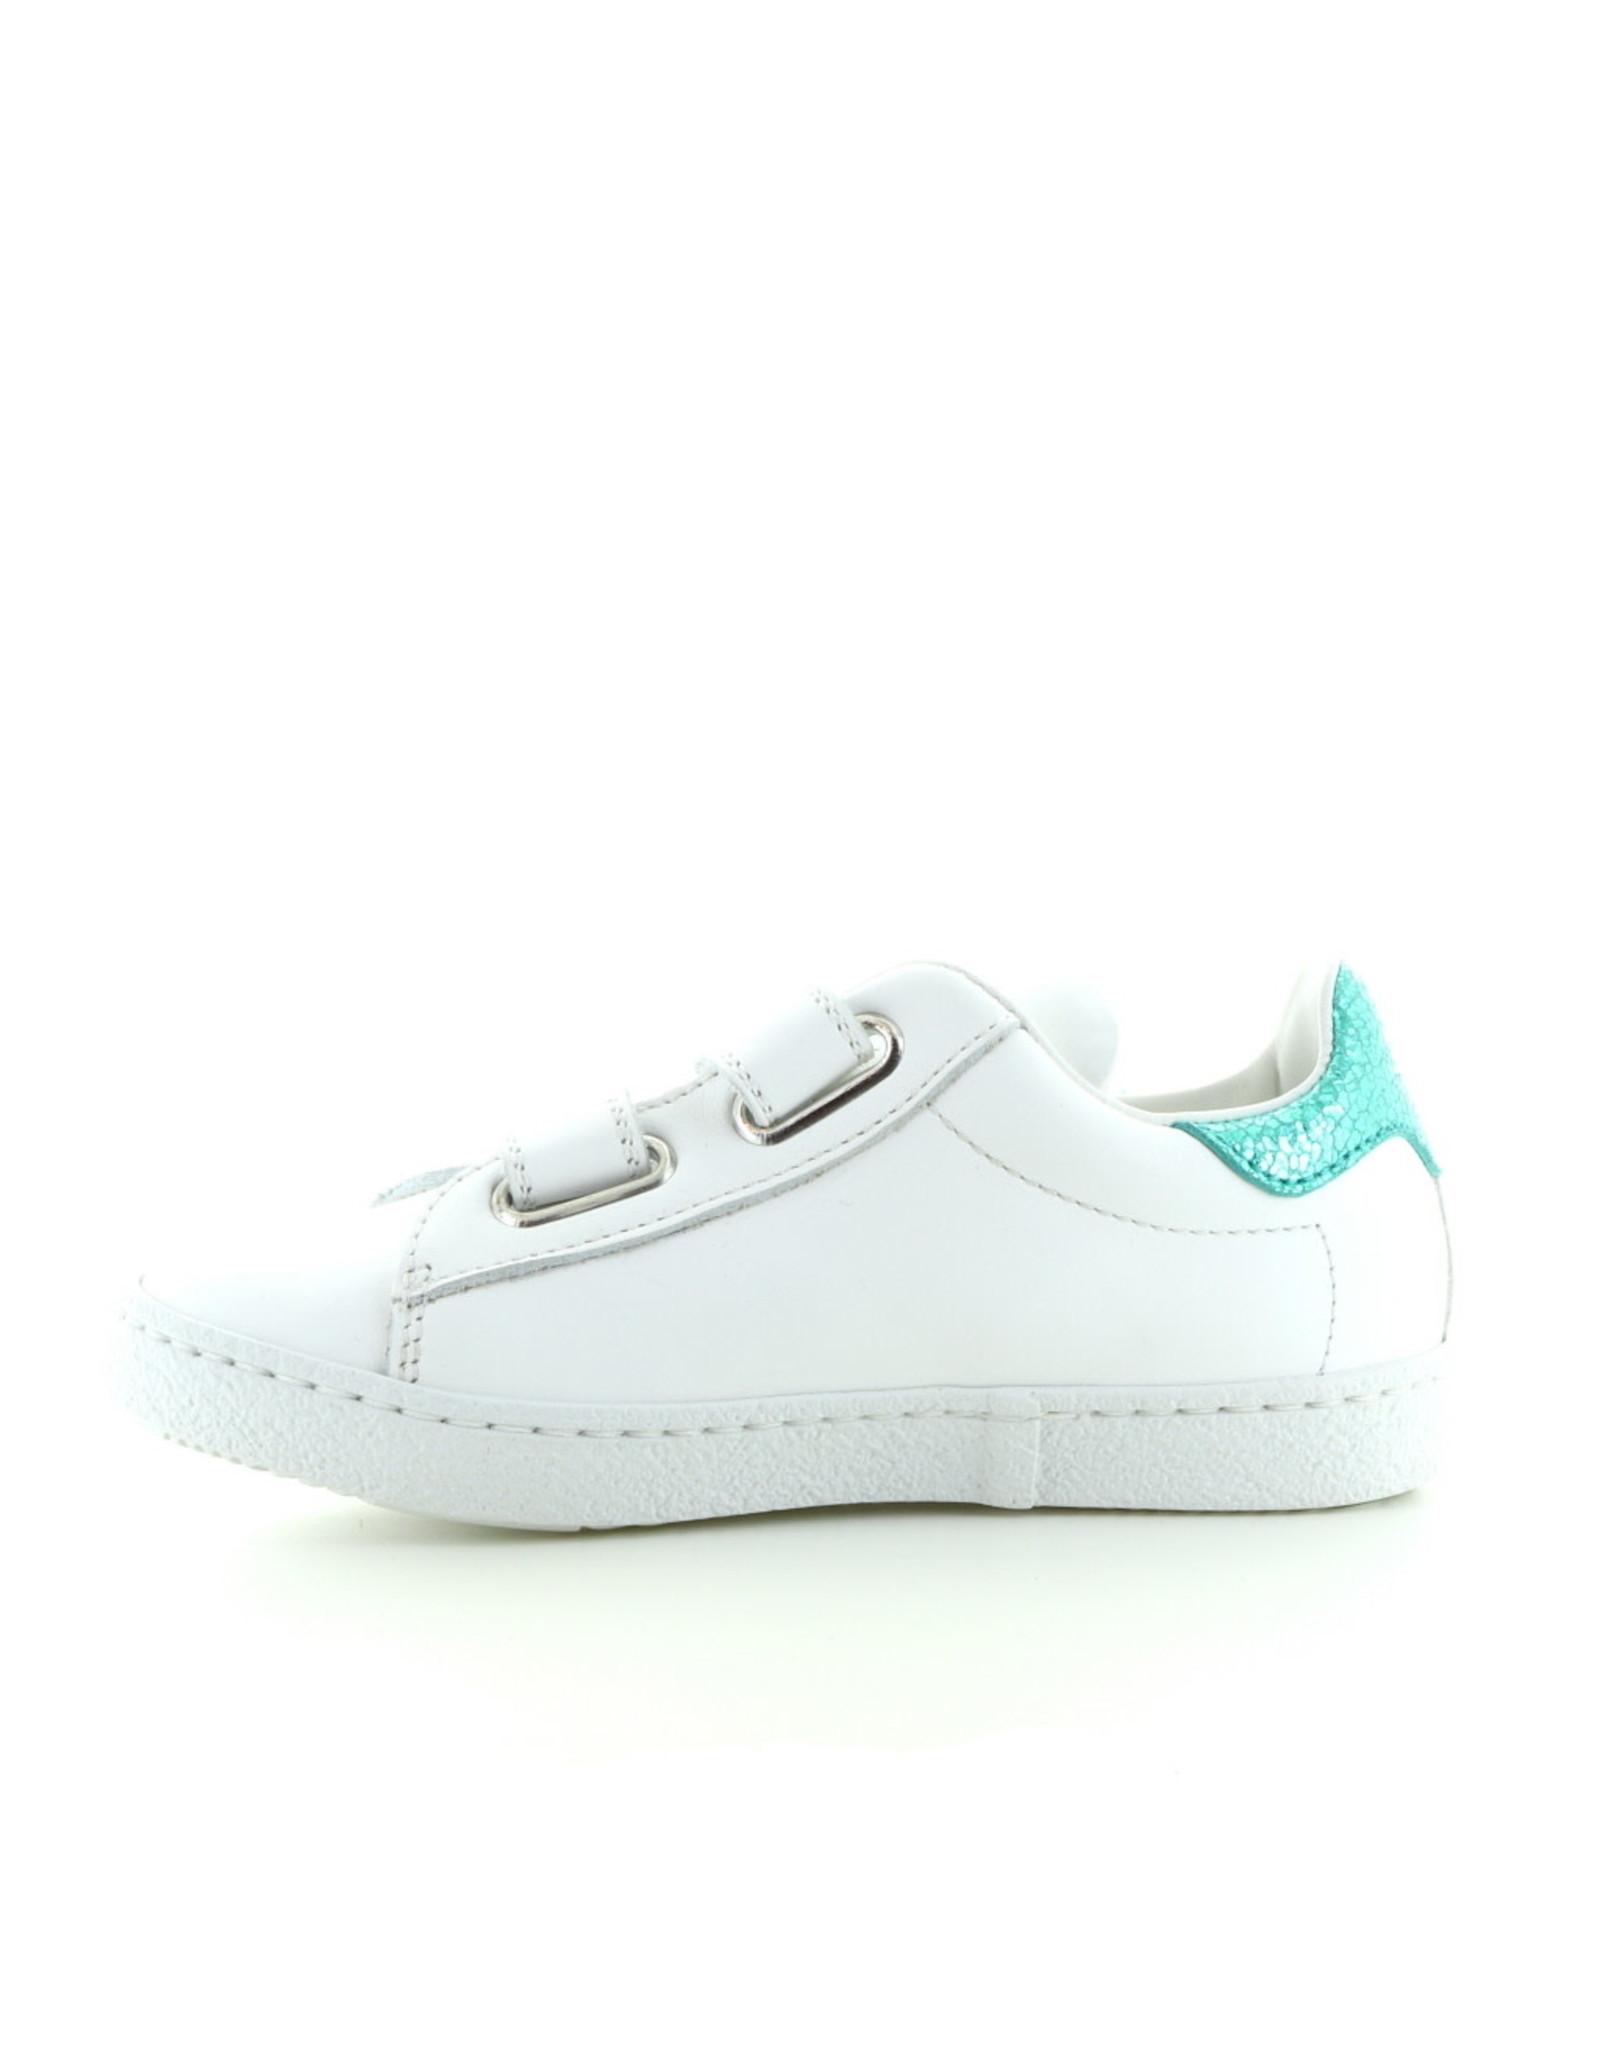 Rondinella 11227 bianco aqua